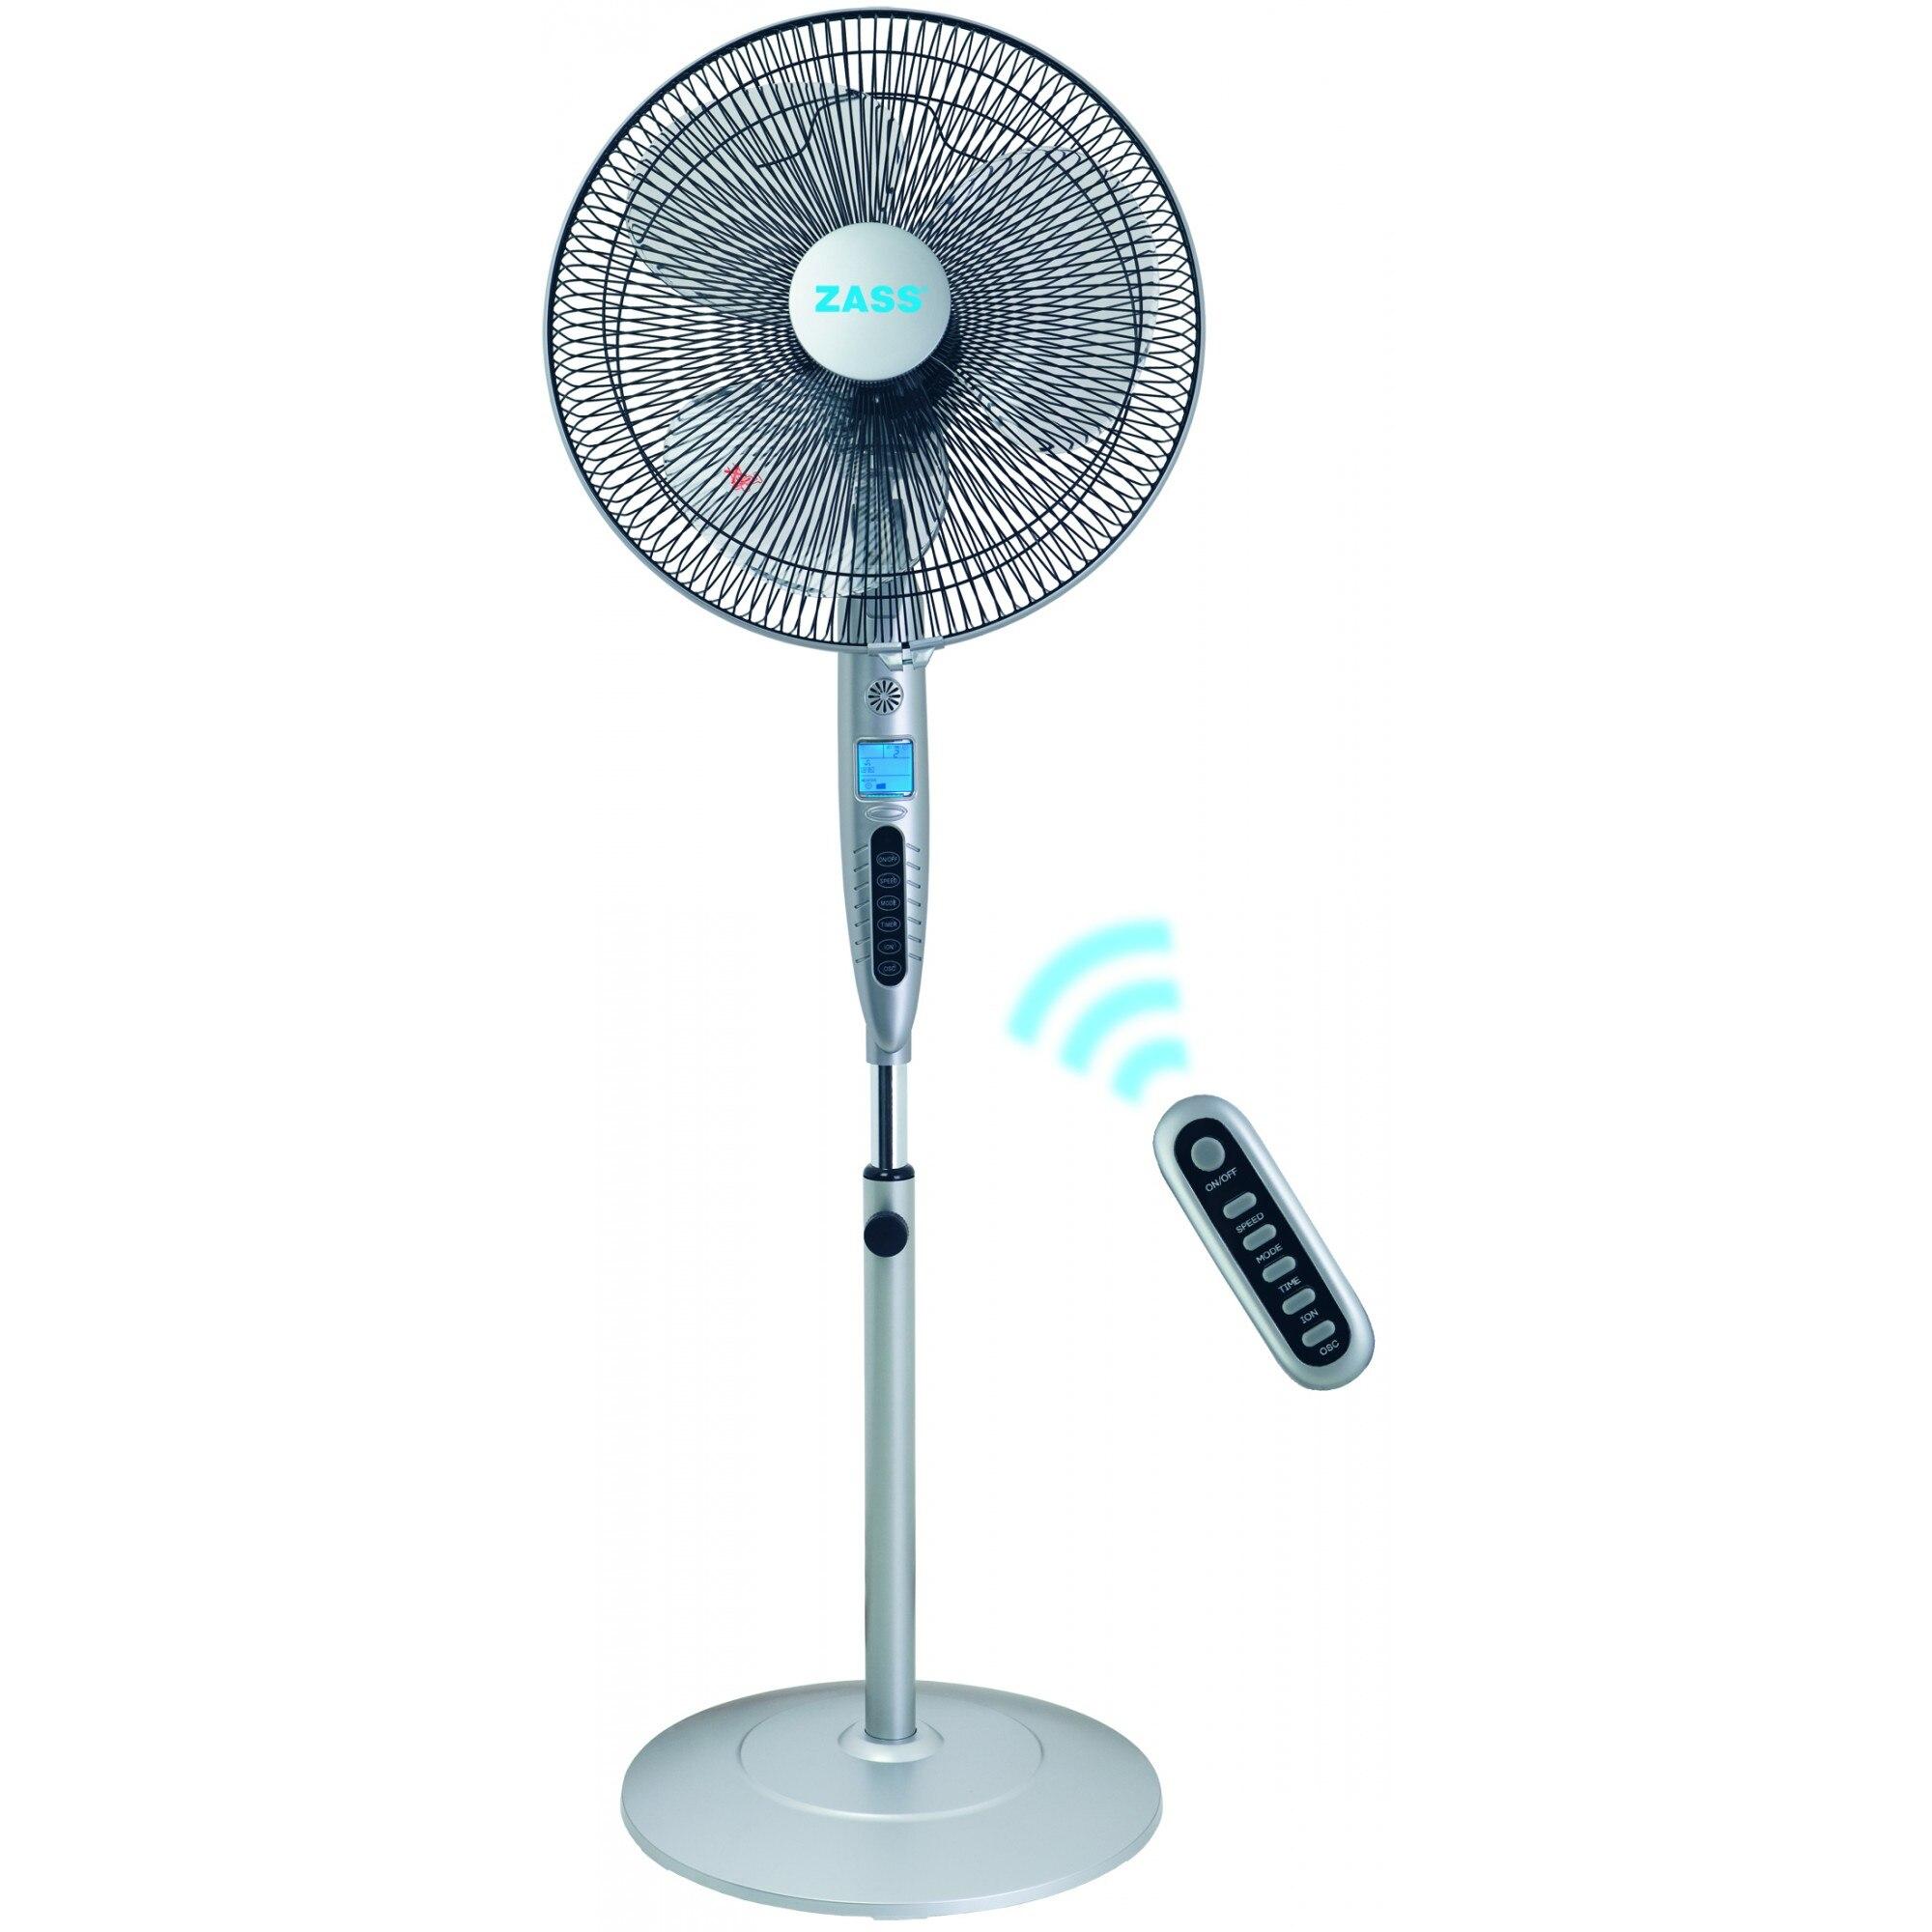 Fotografie Ventilator Zass ZFTI 10R, 55W, display LCD, ionizare, timer, oscilare, telecomanda, Gri